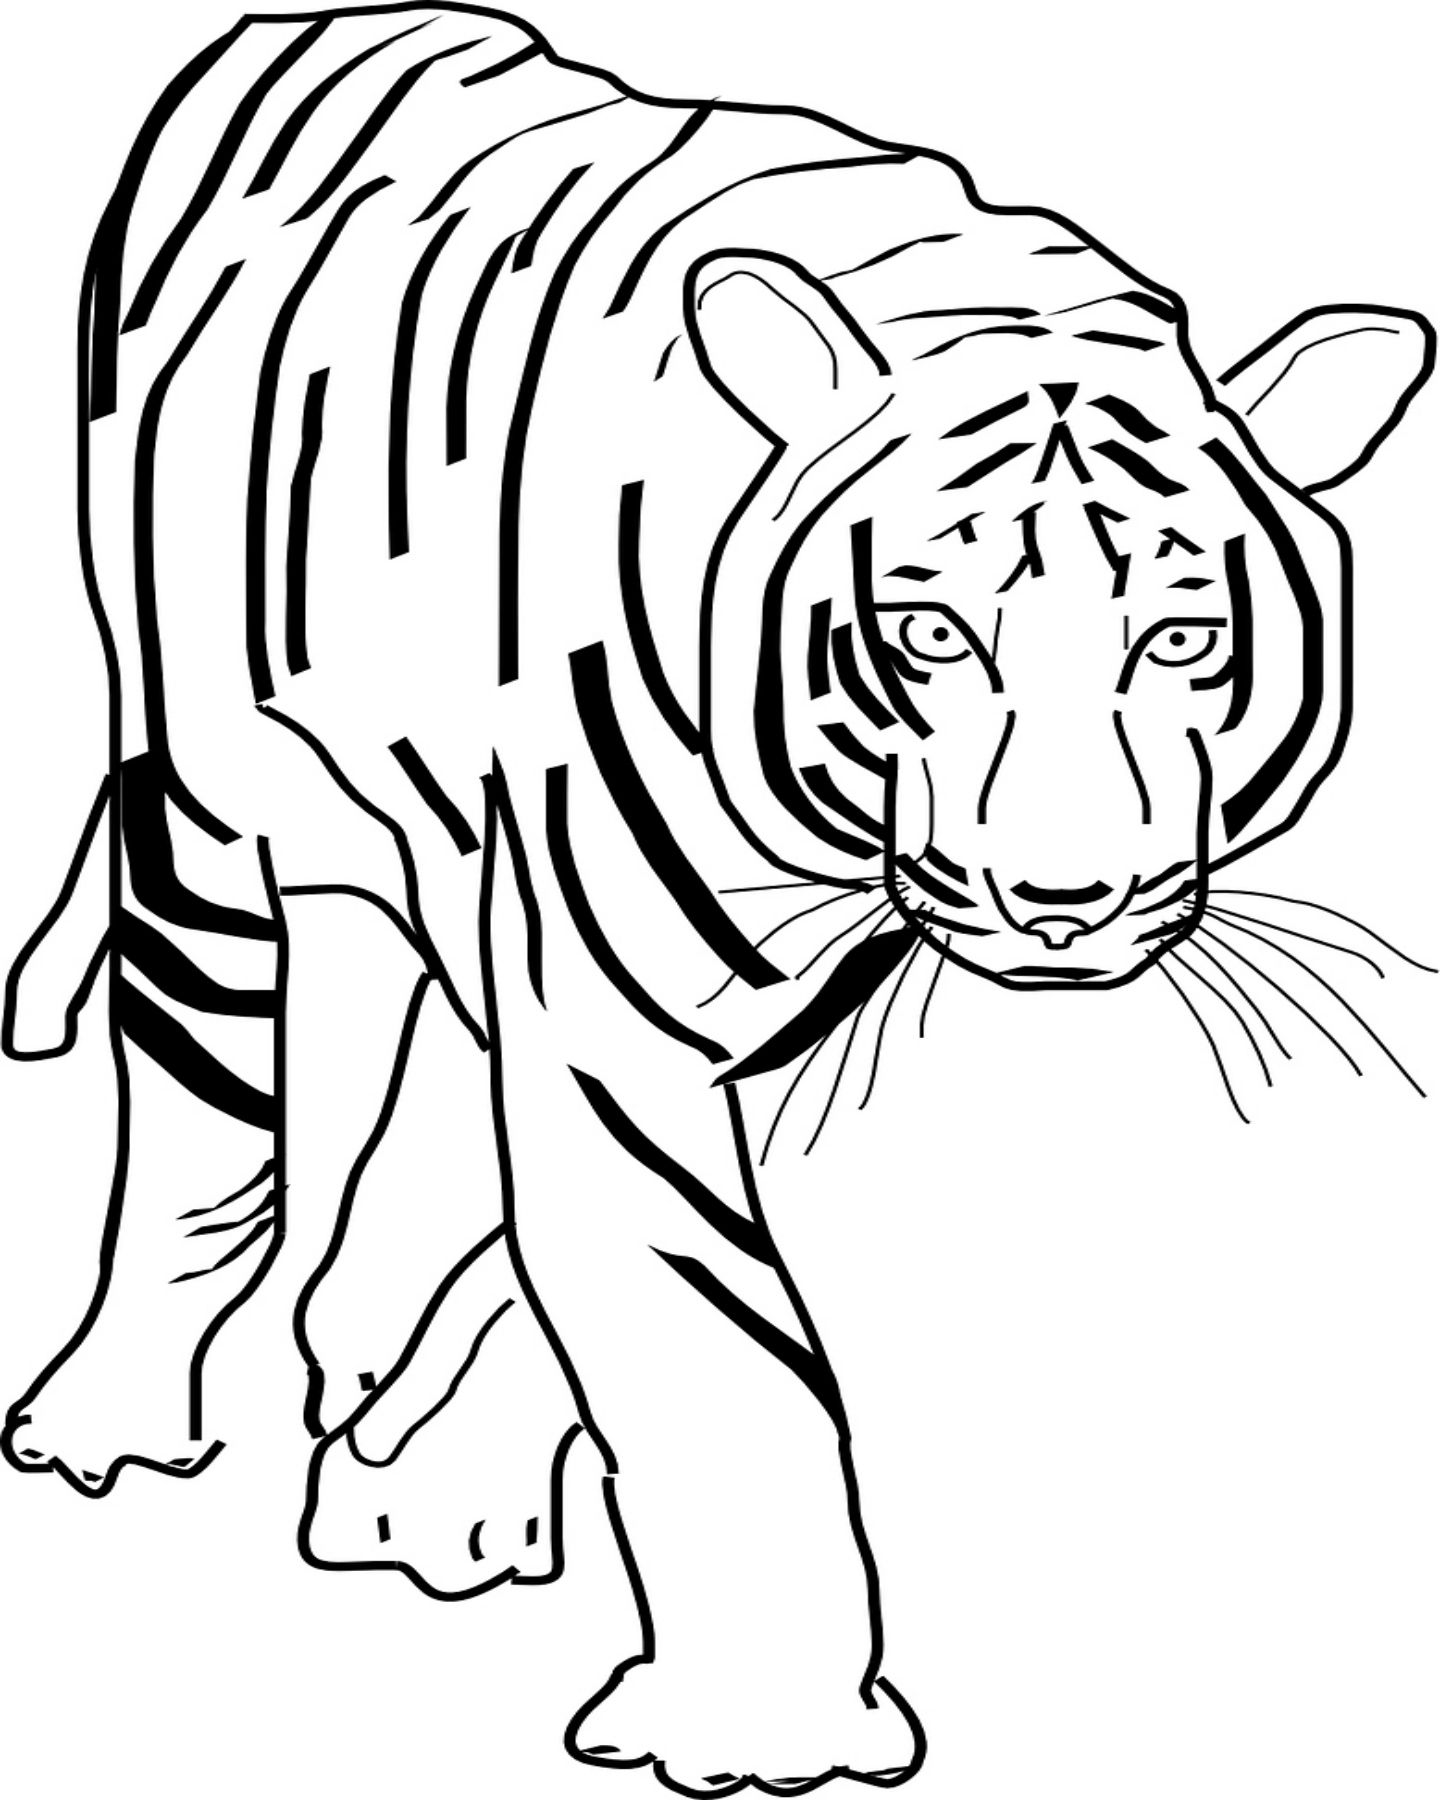 Realistic Tiger Coloring Page Kids Corner Pinterest Kids corner